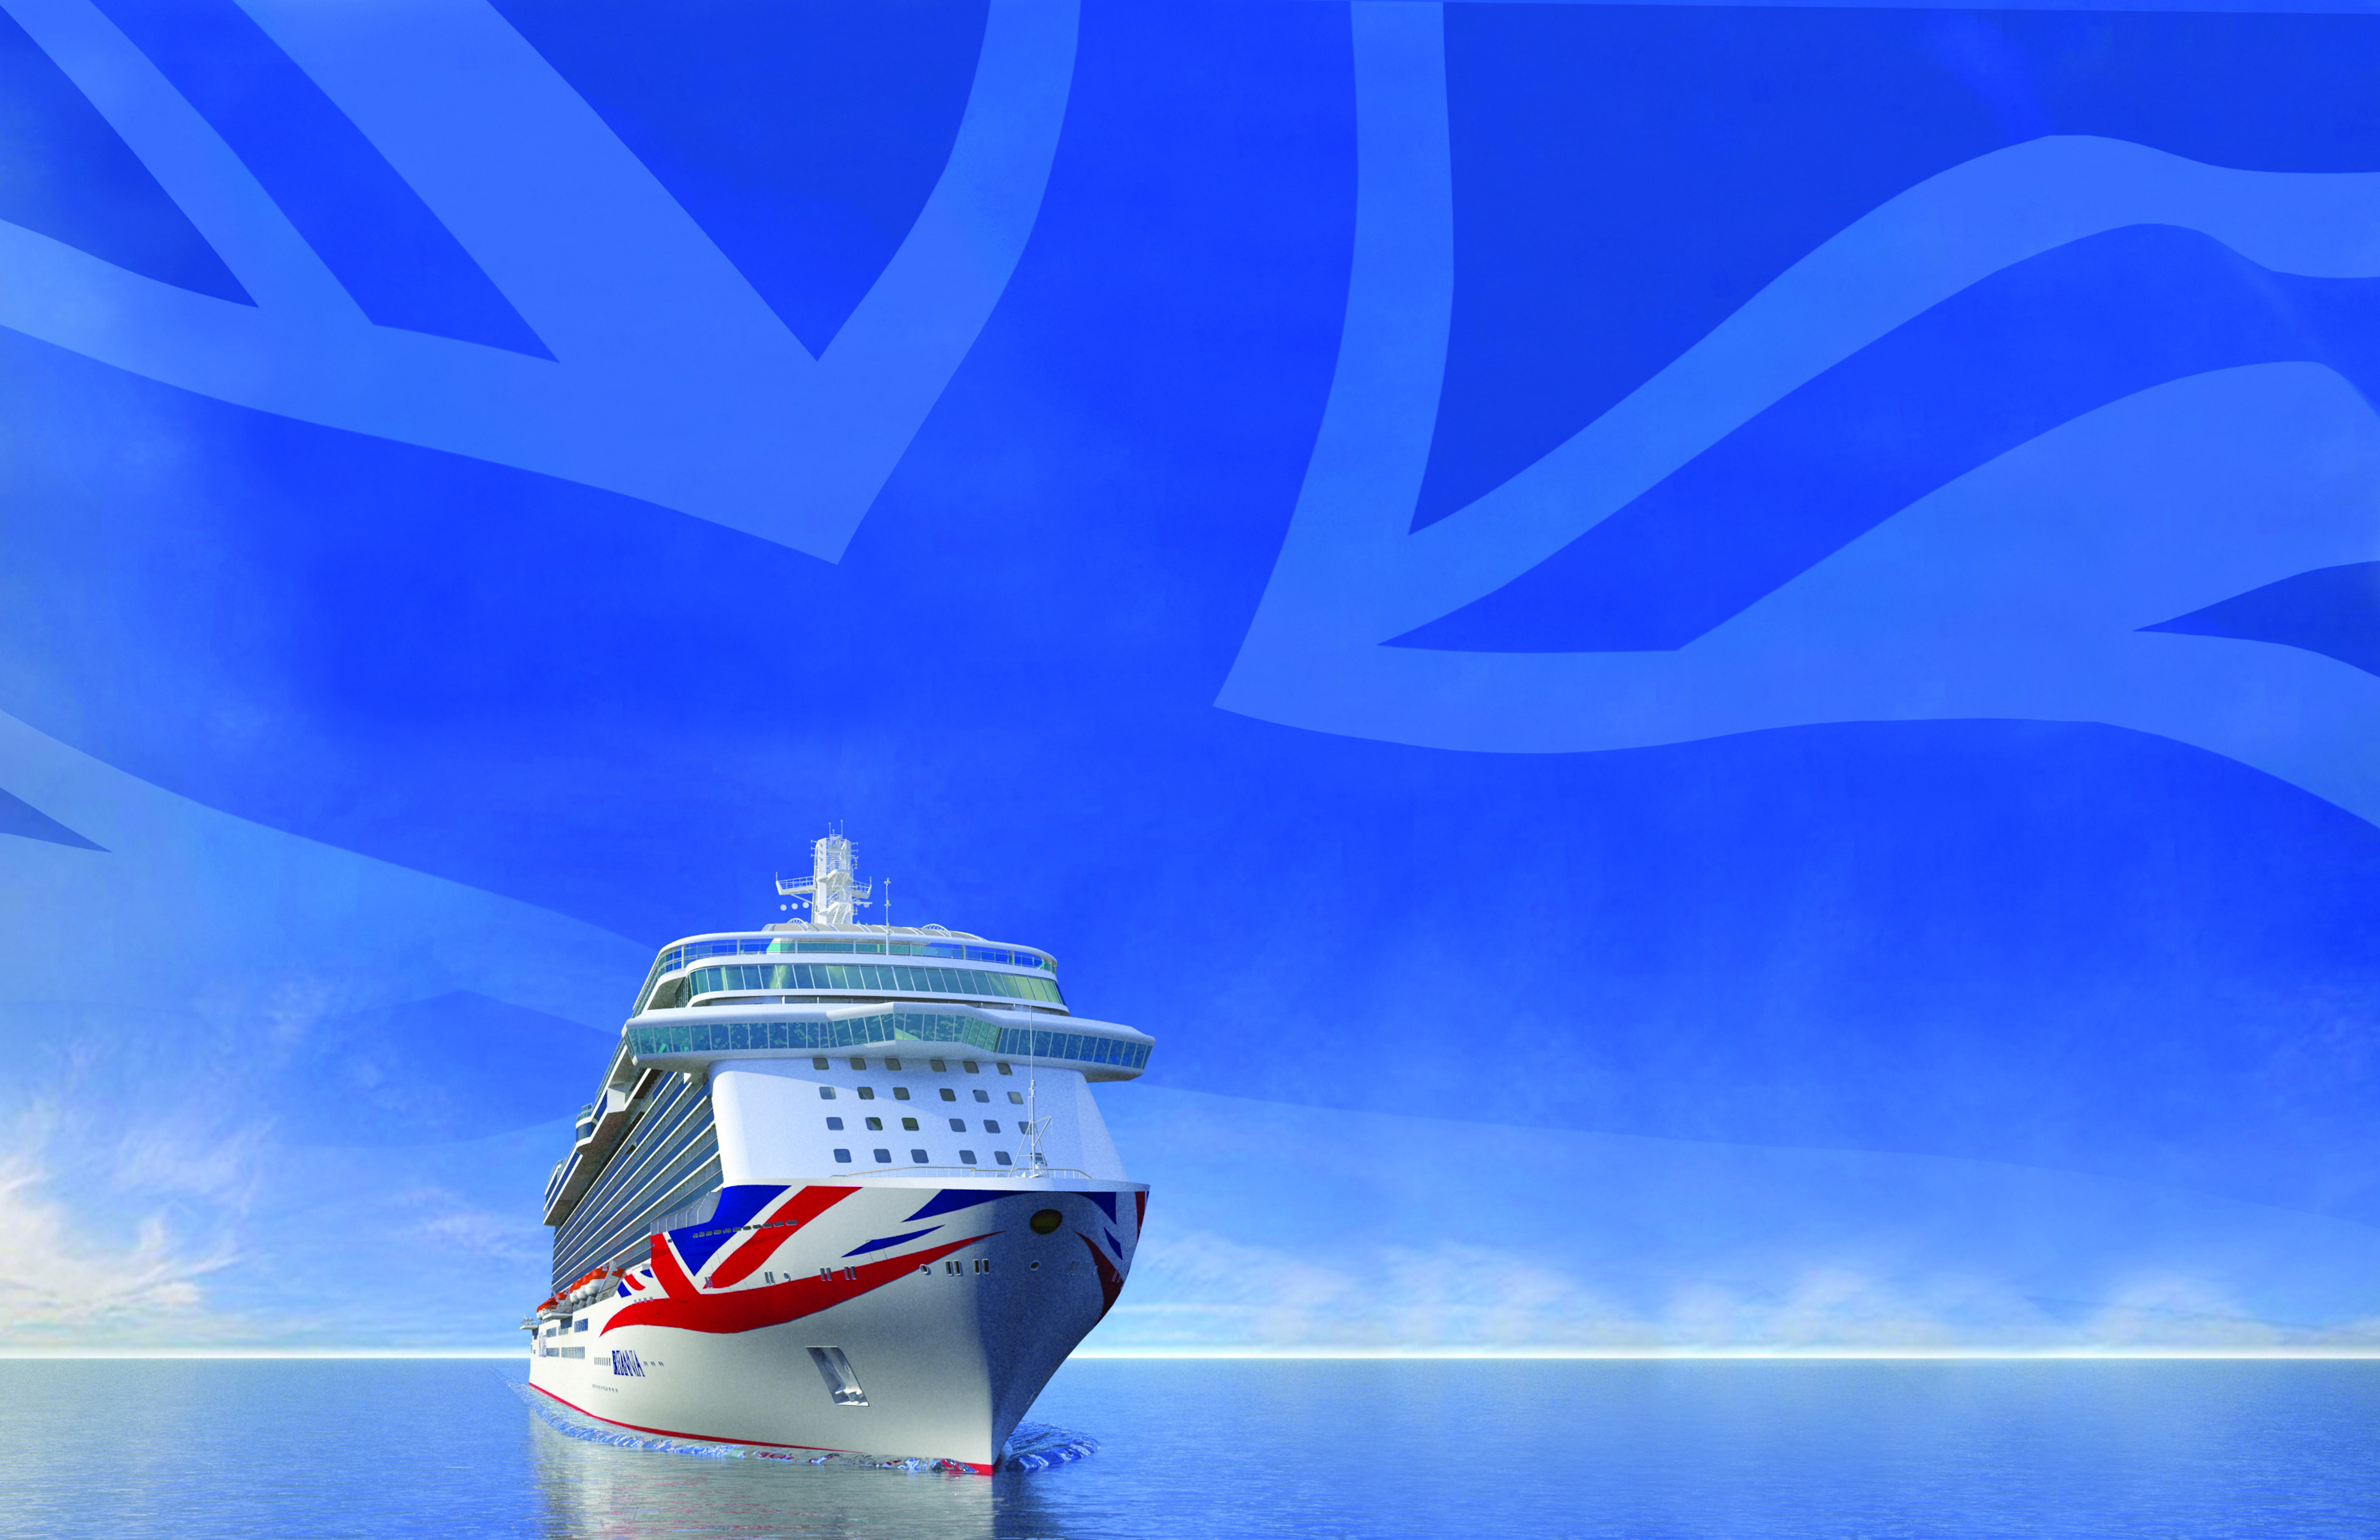 P&O Cruises image